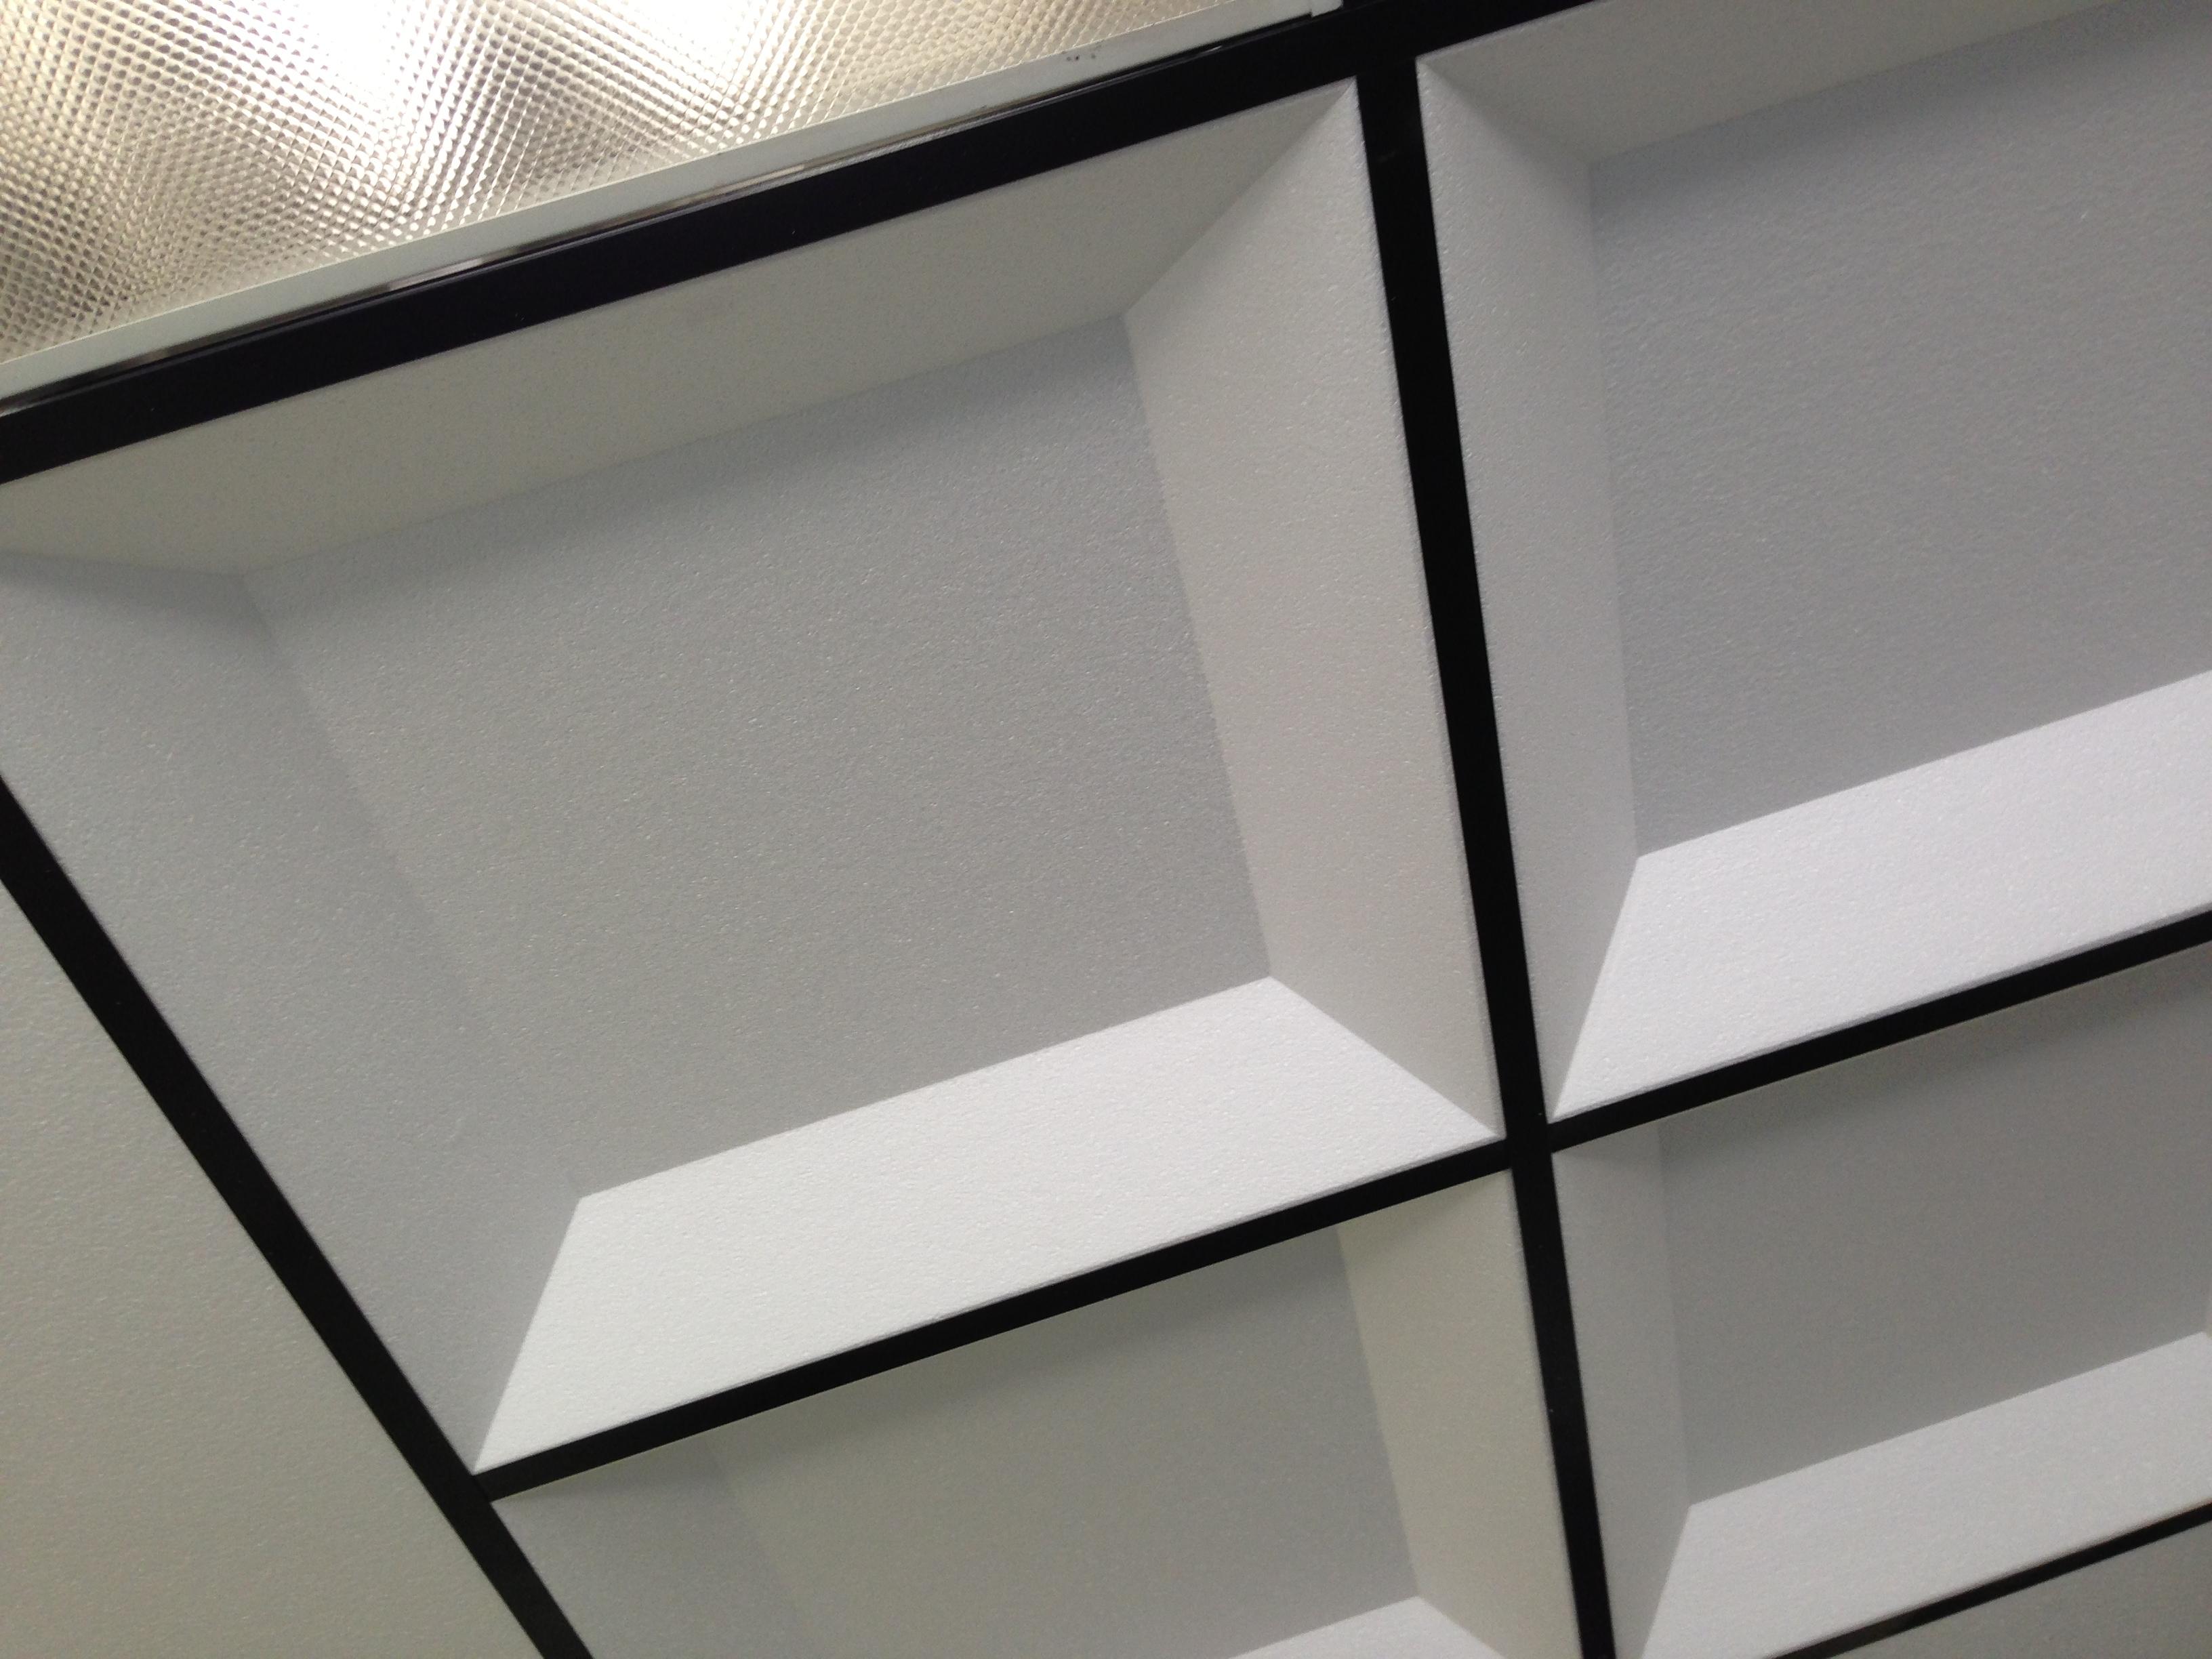 ceiling tiles  IDS Group  httpwwwIDS2GOcom